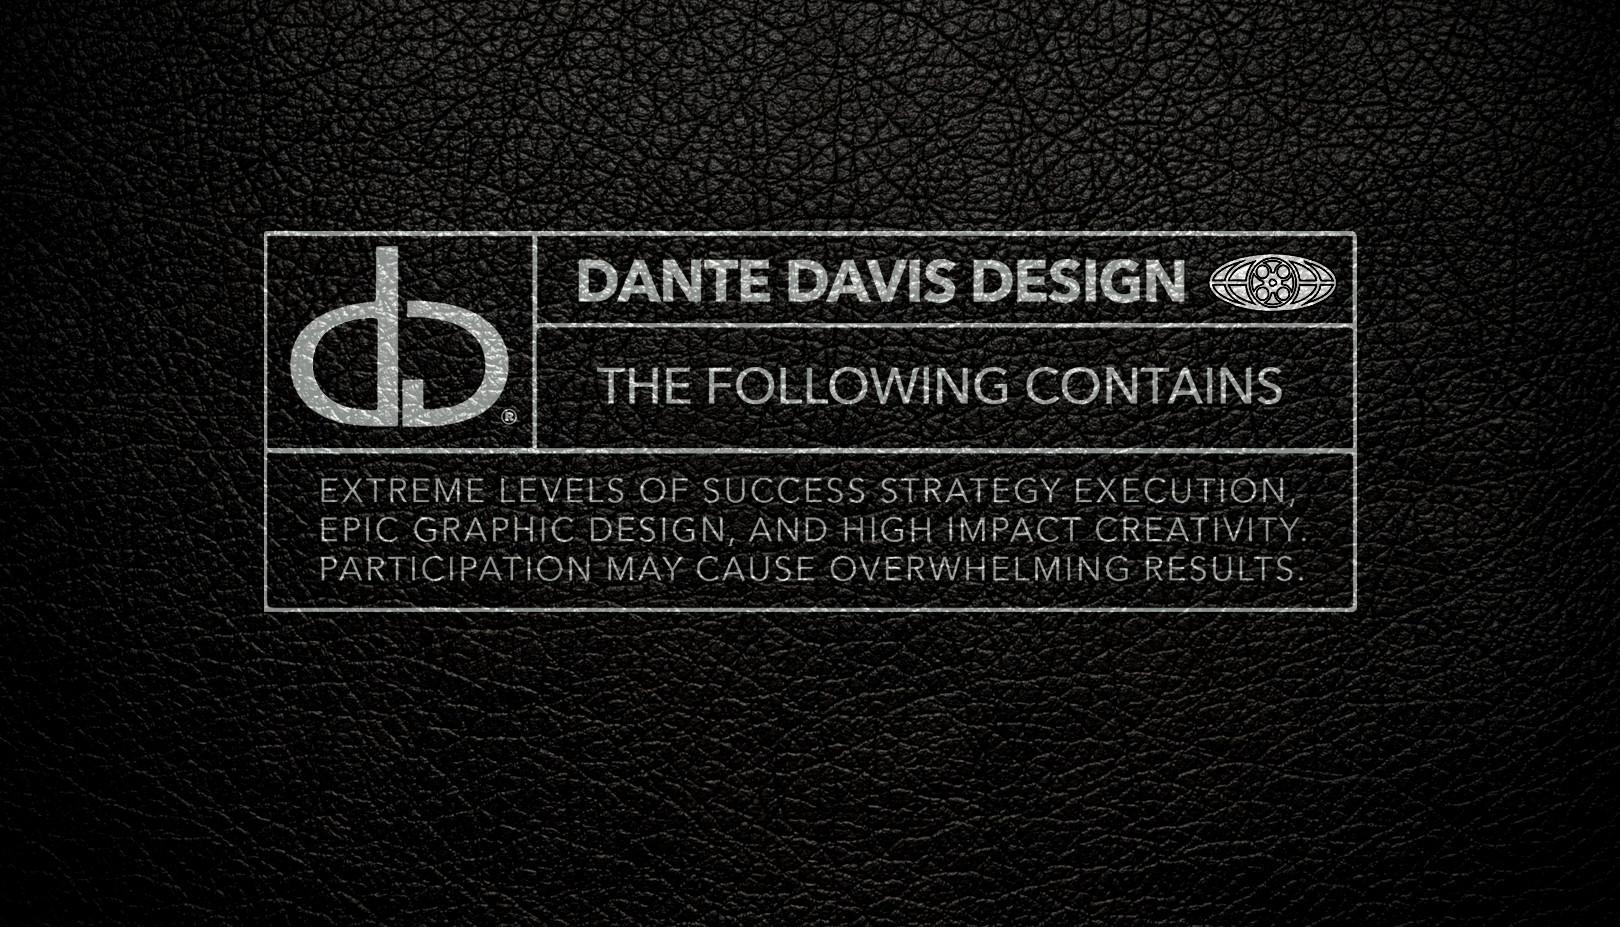 dantedavisdesign-new-background-advisory-e1452541163583